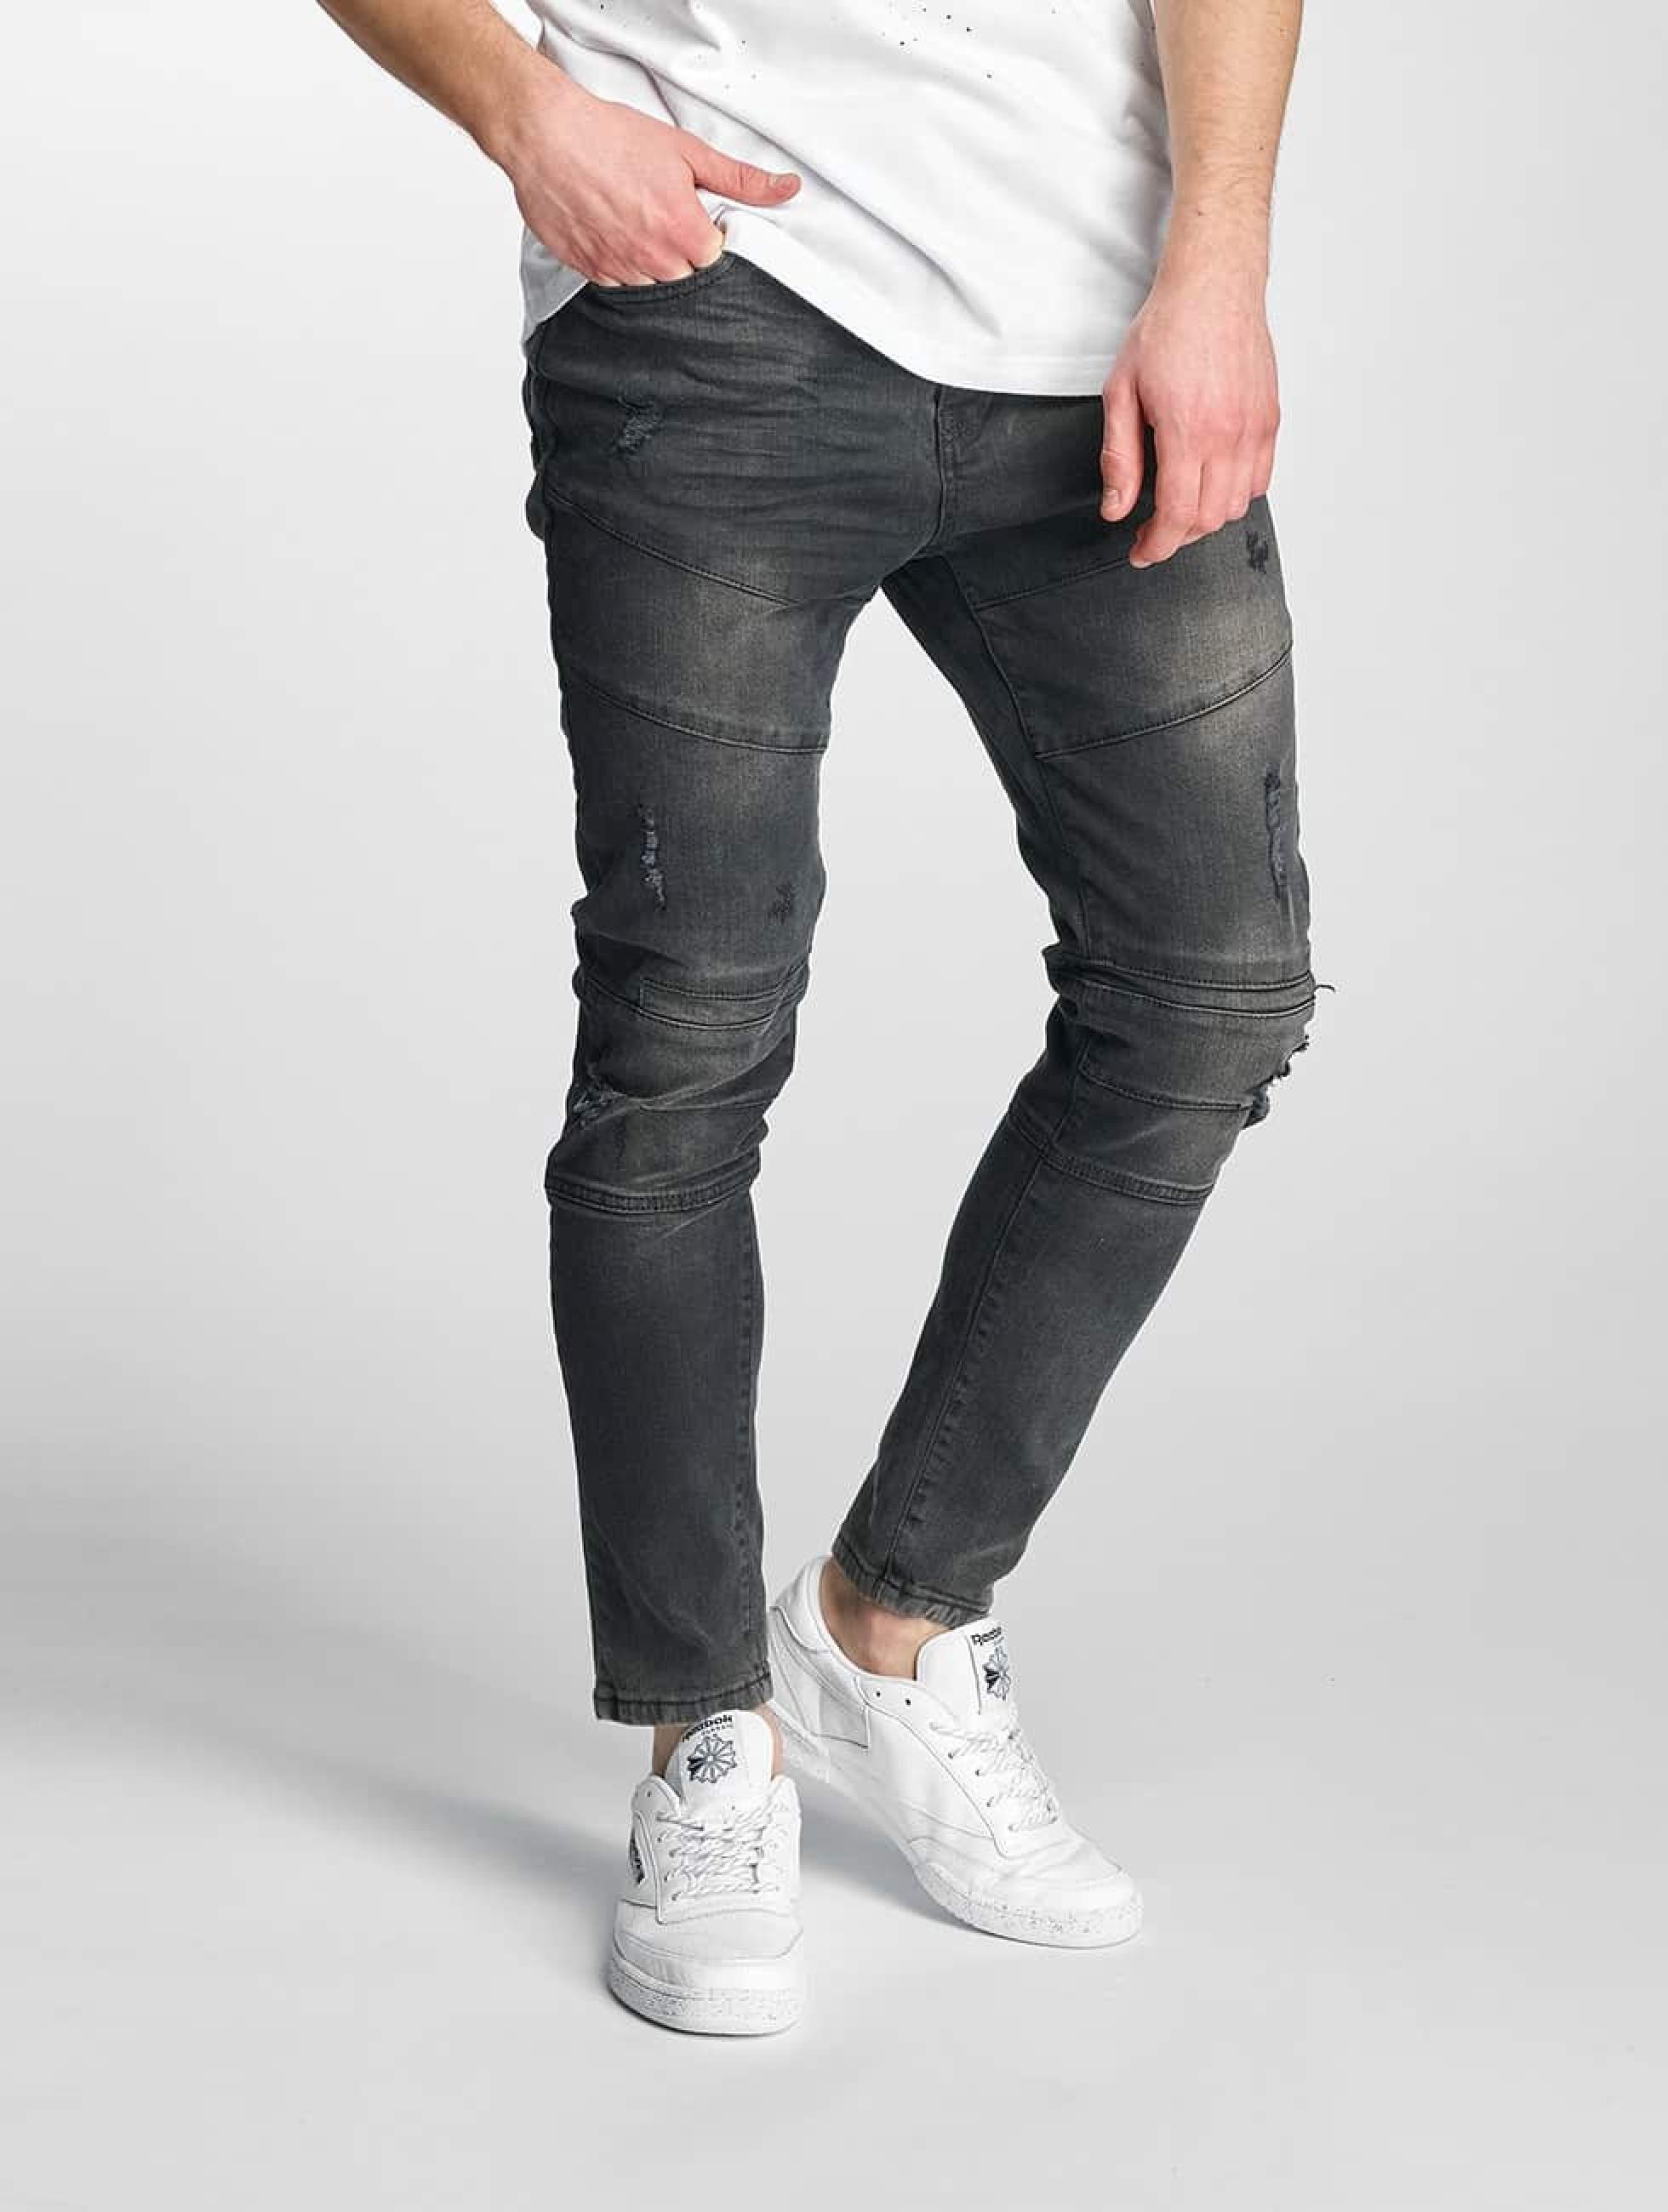 Just Rhyse / Slim Fit Jeans Tulum in black W 33